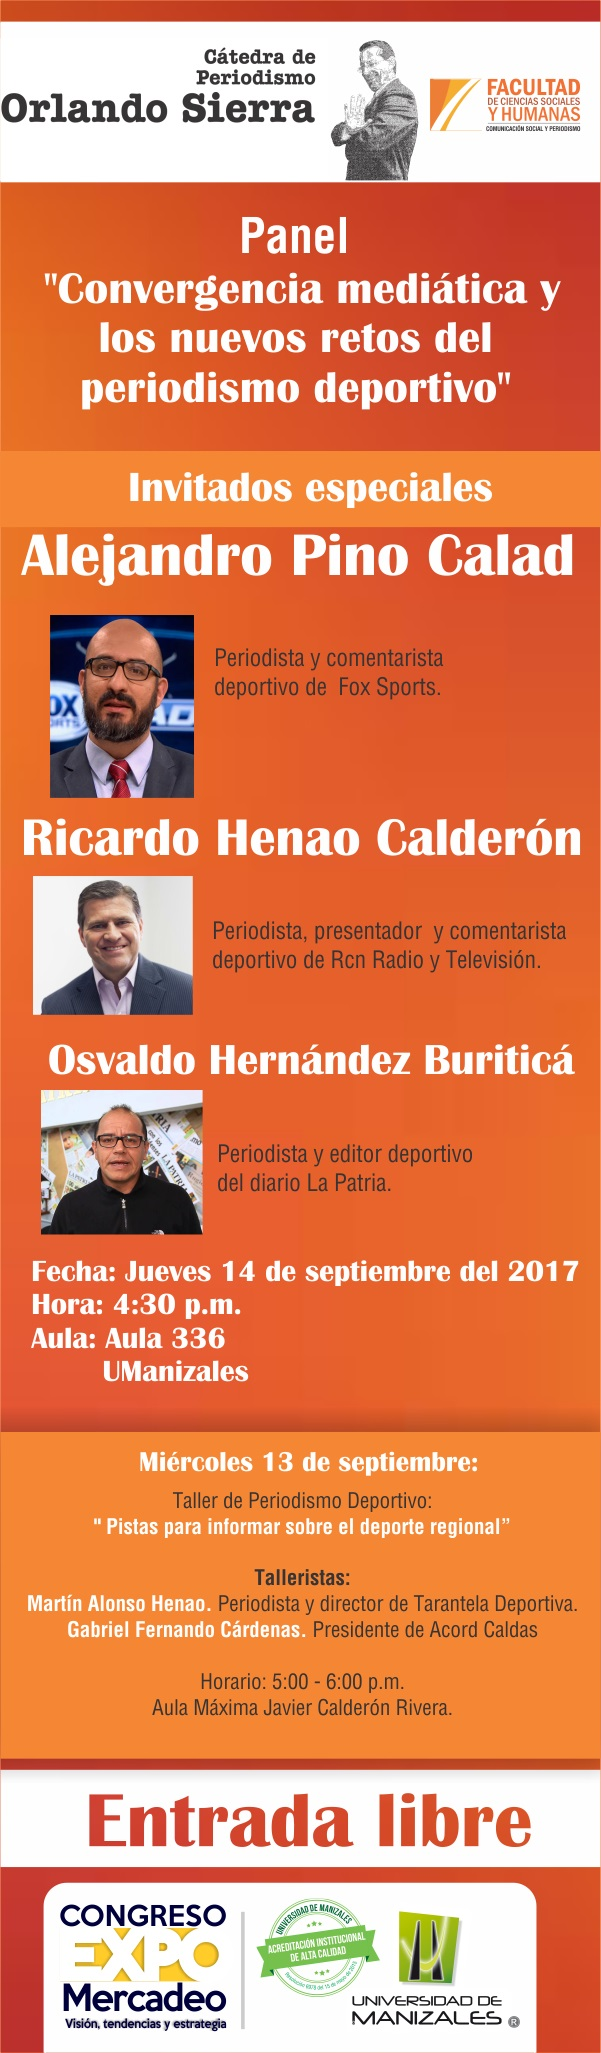 Cátedra Orlando Sierra